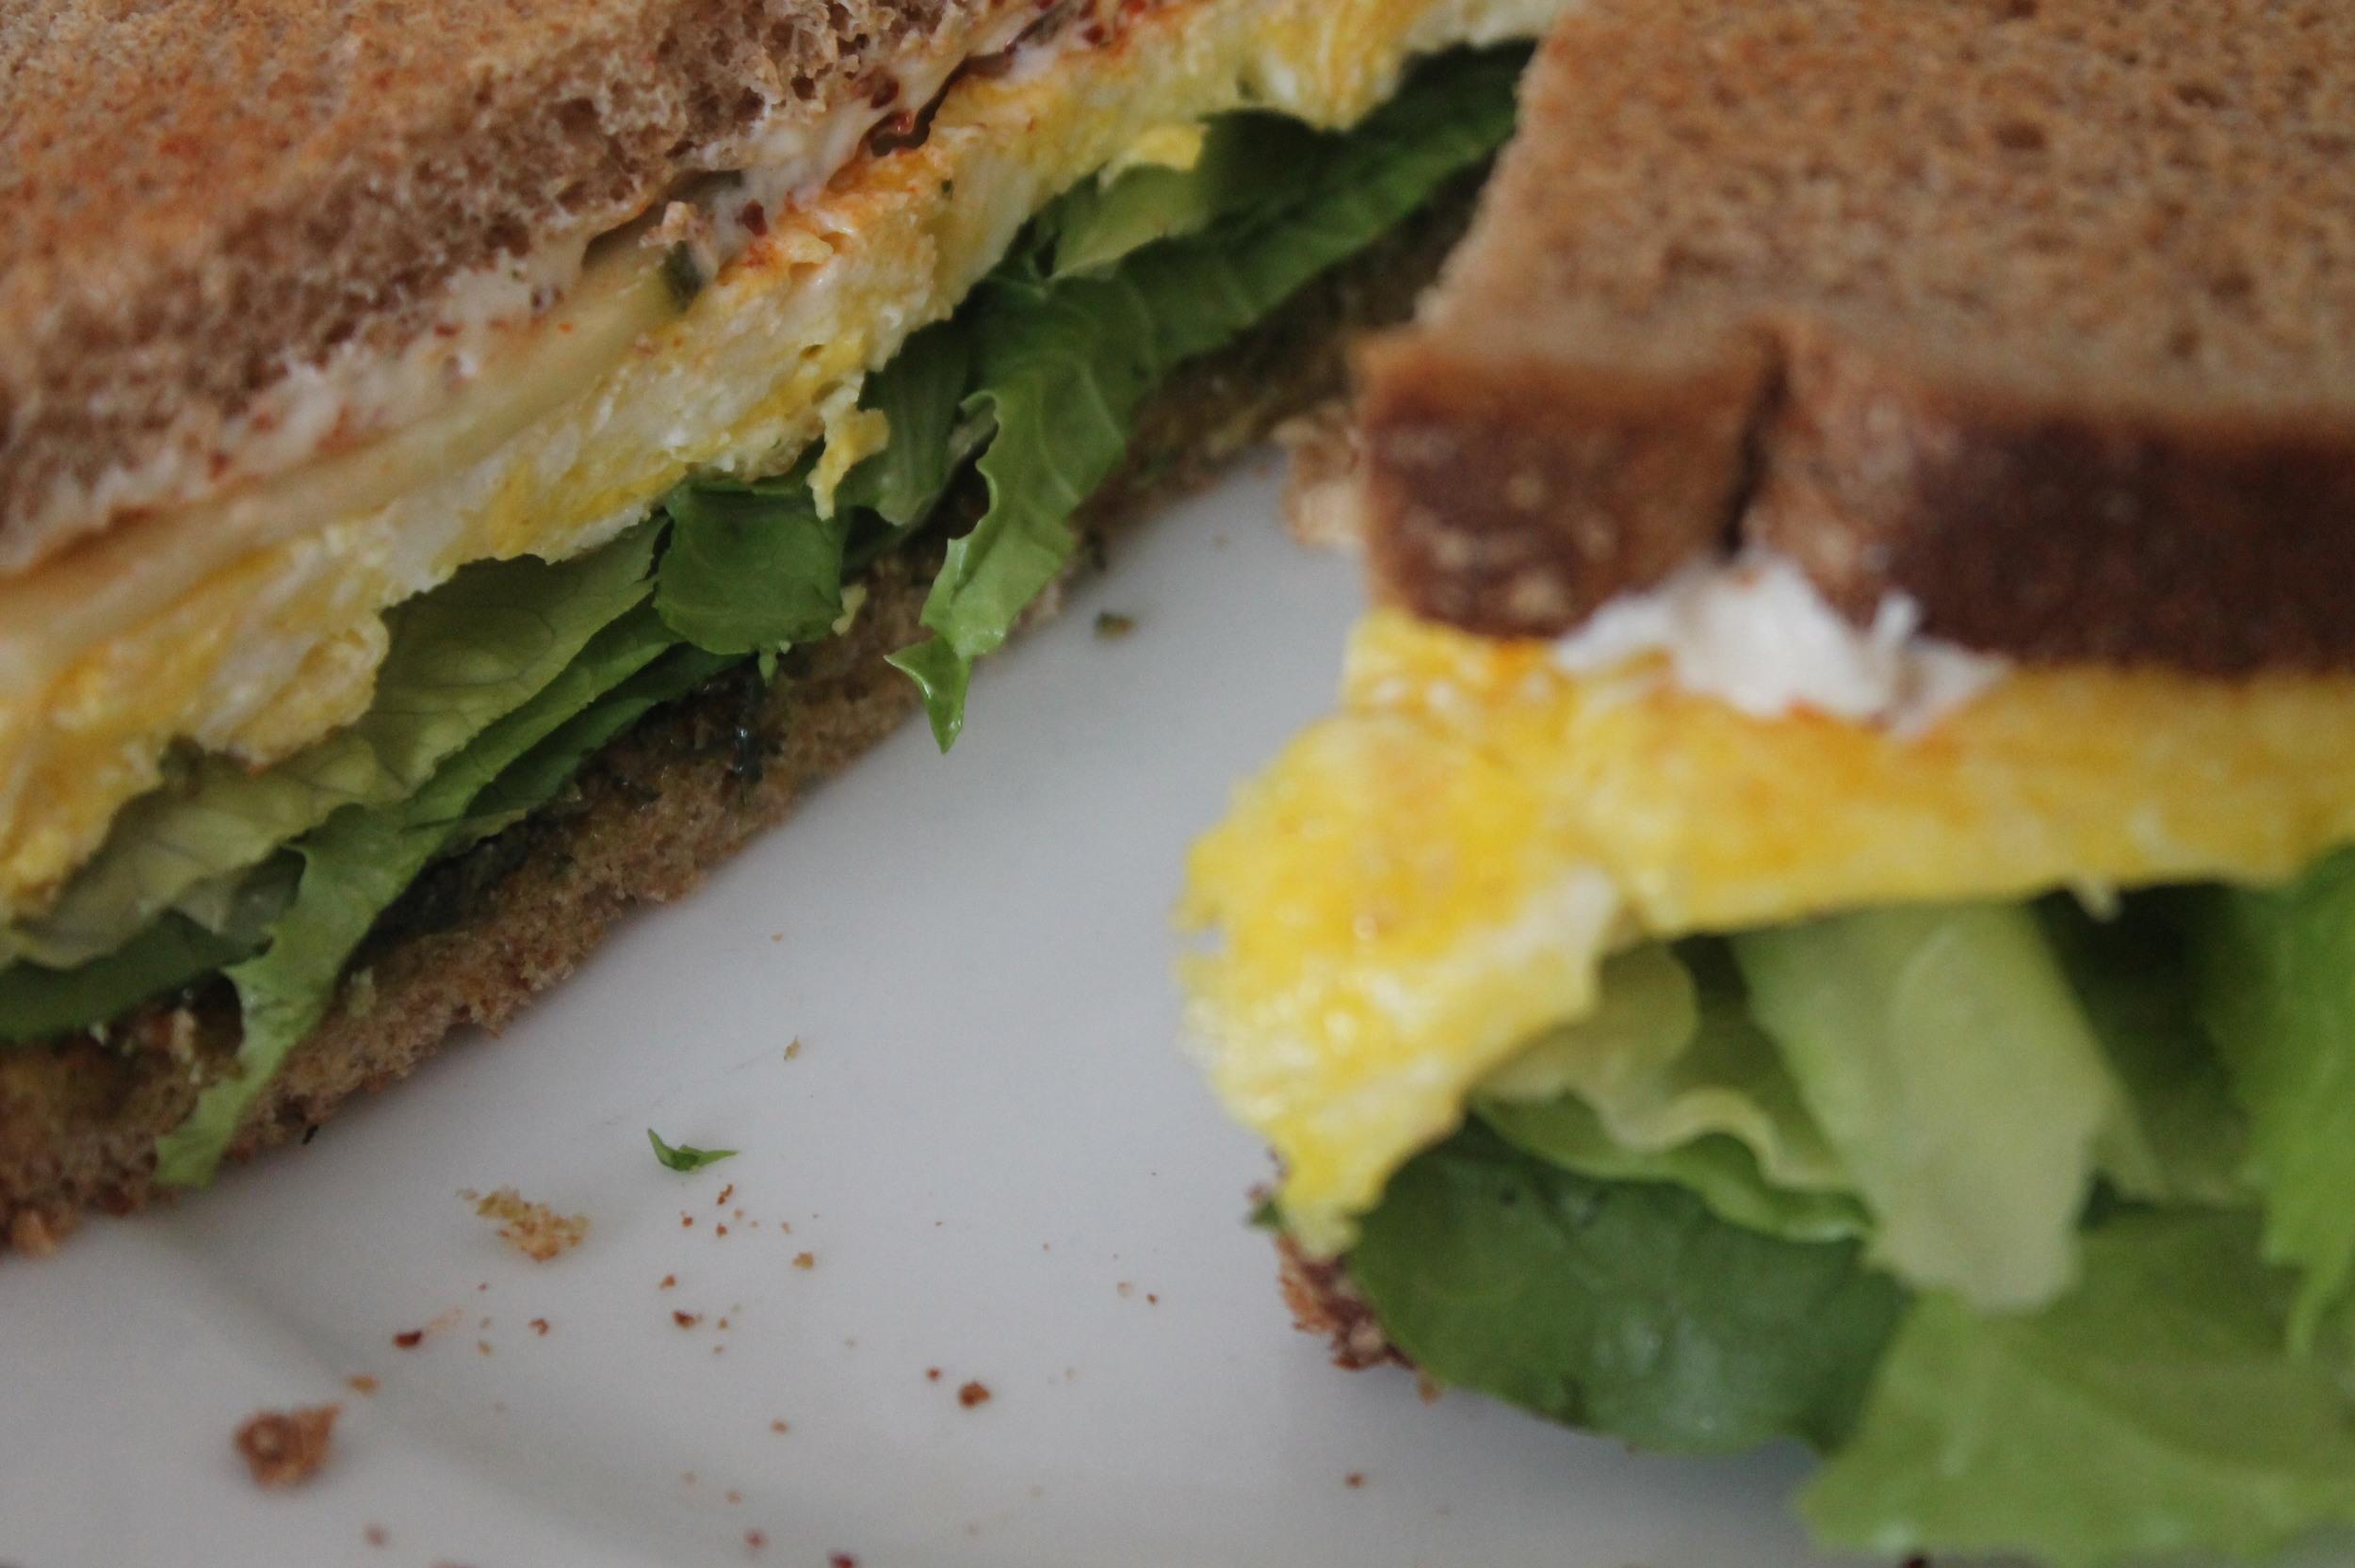 Gotta love a good breakfast sandwich.